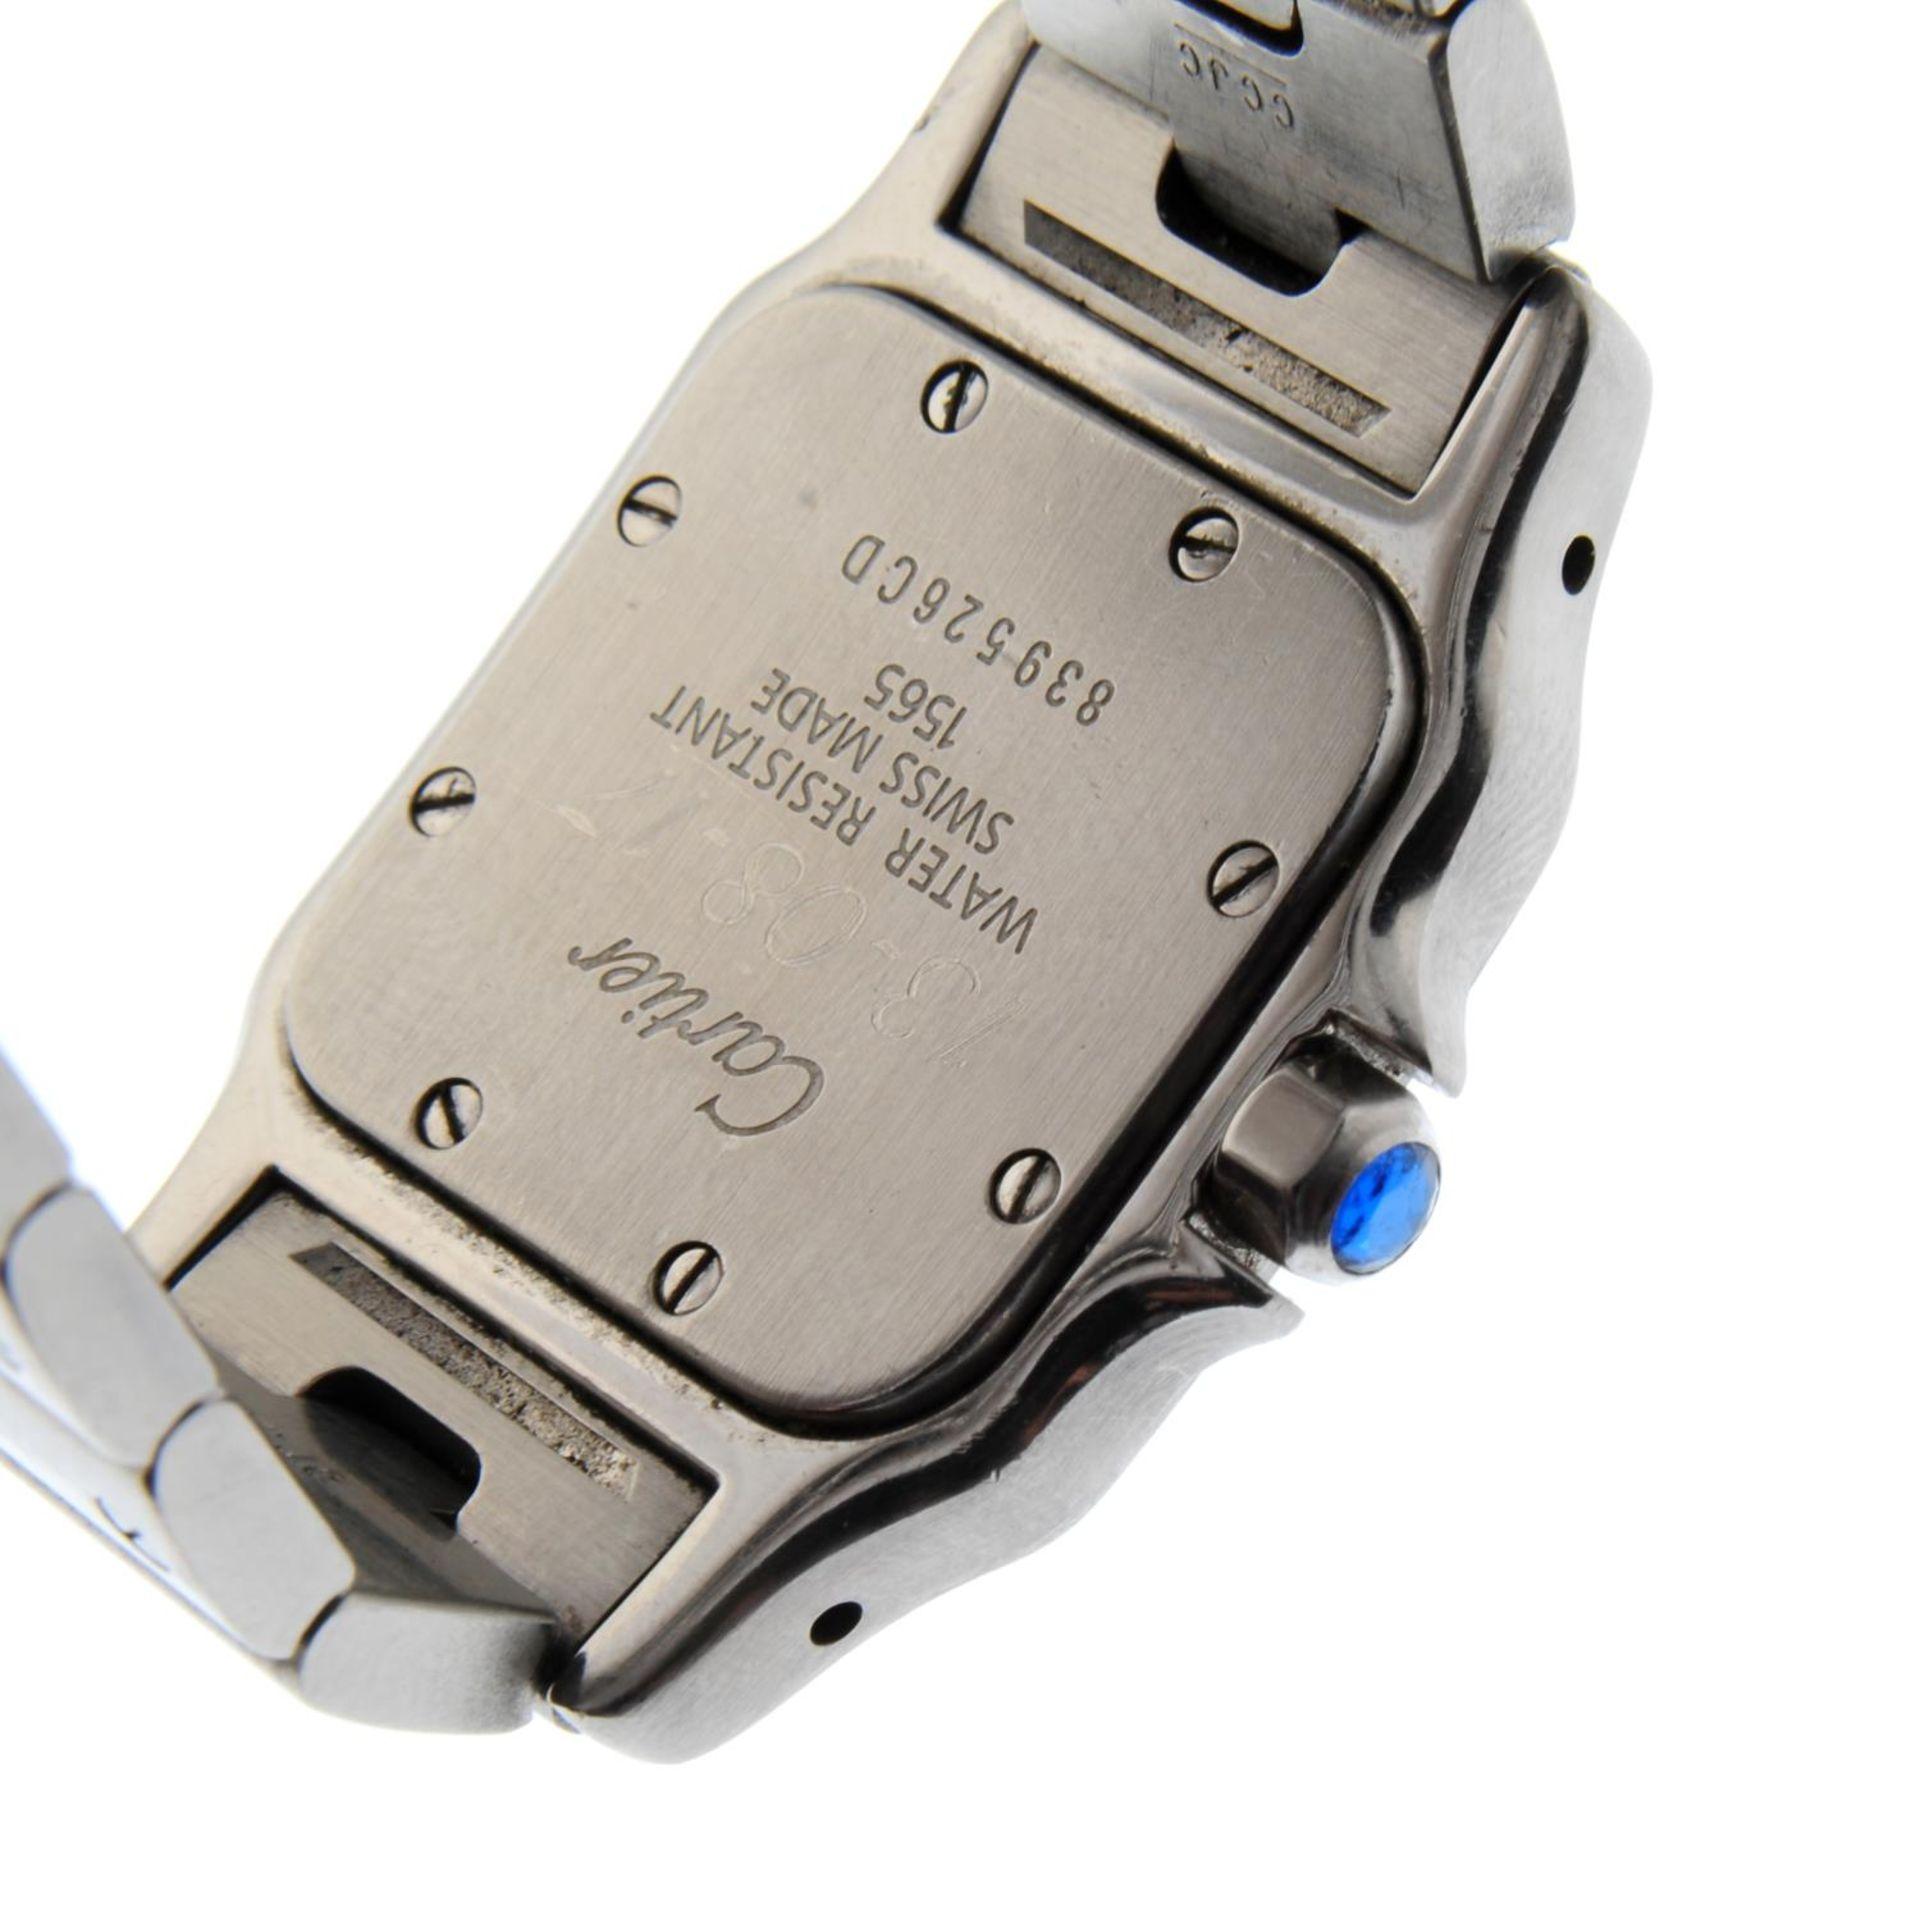 CARTIER - a Santos bracelet watch. - Bild 2 aus 5